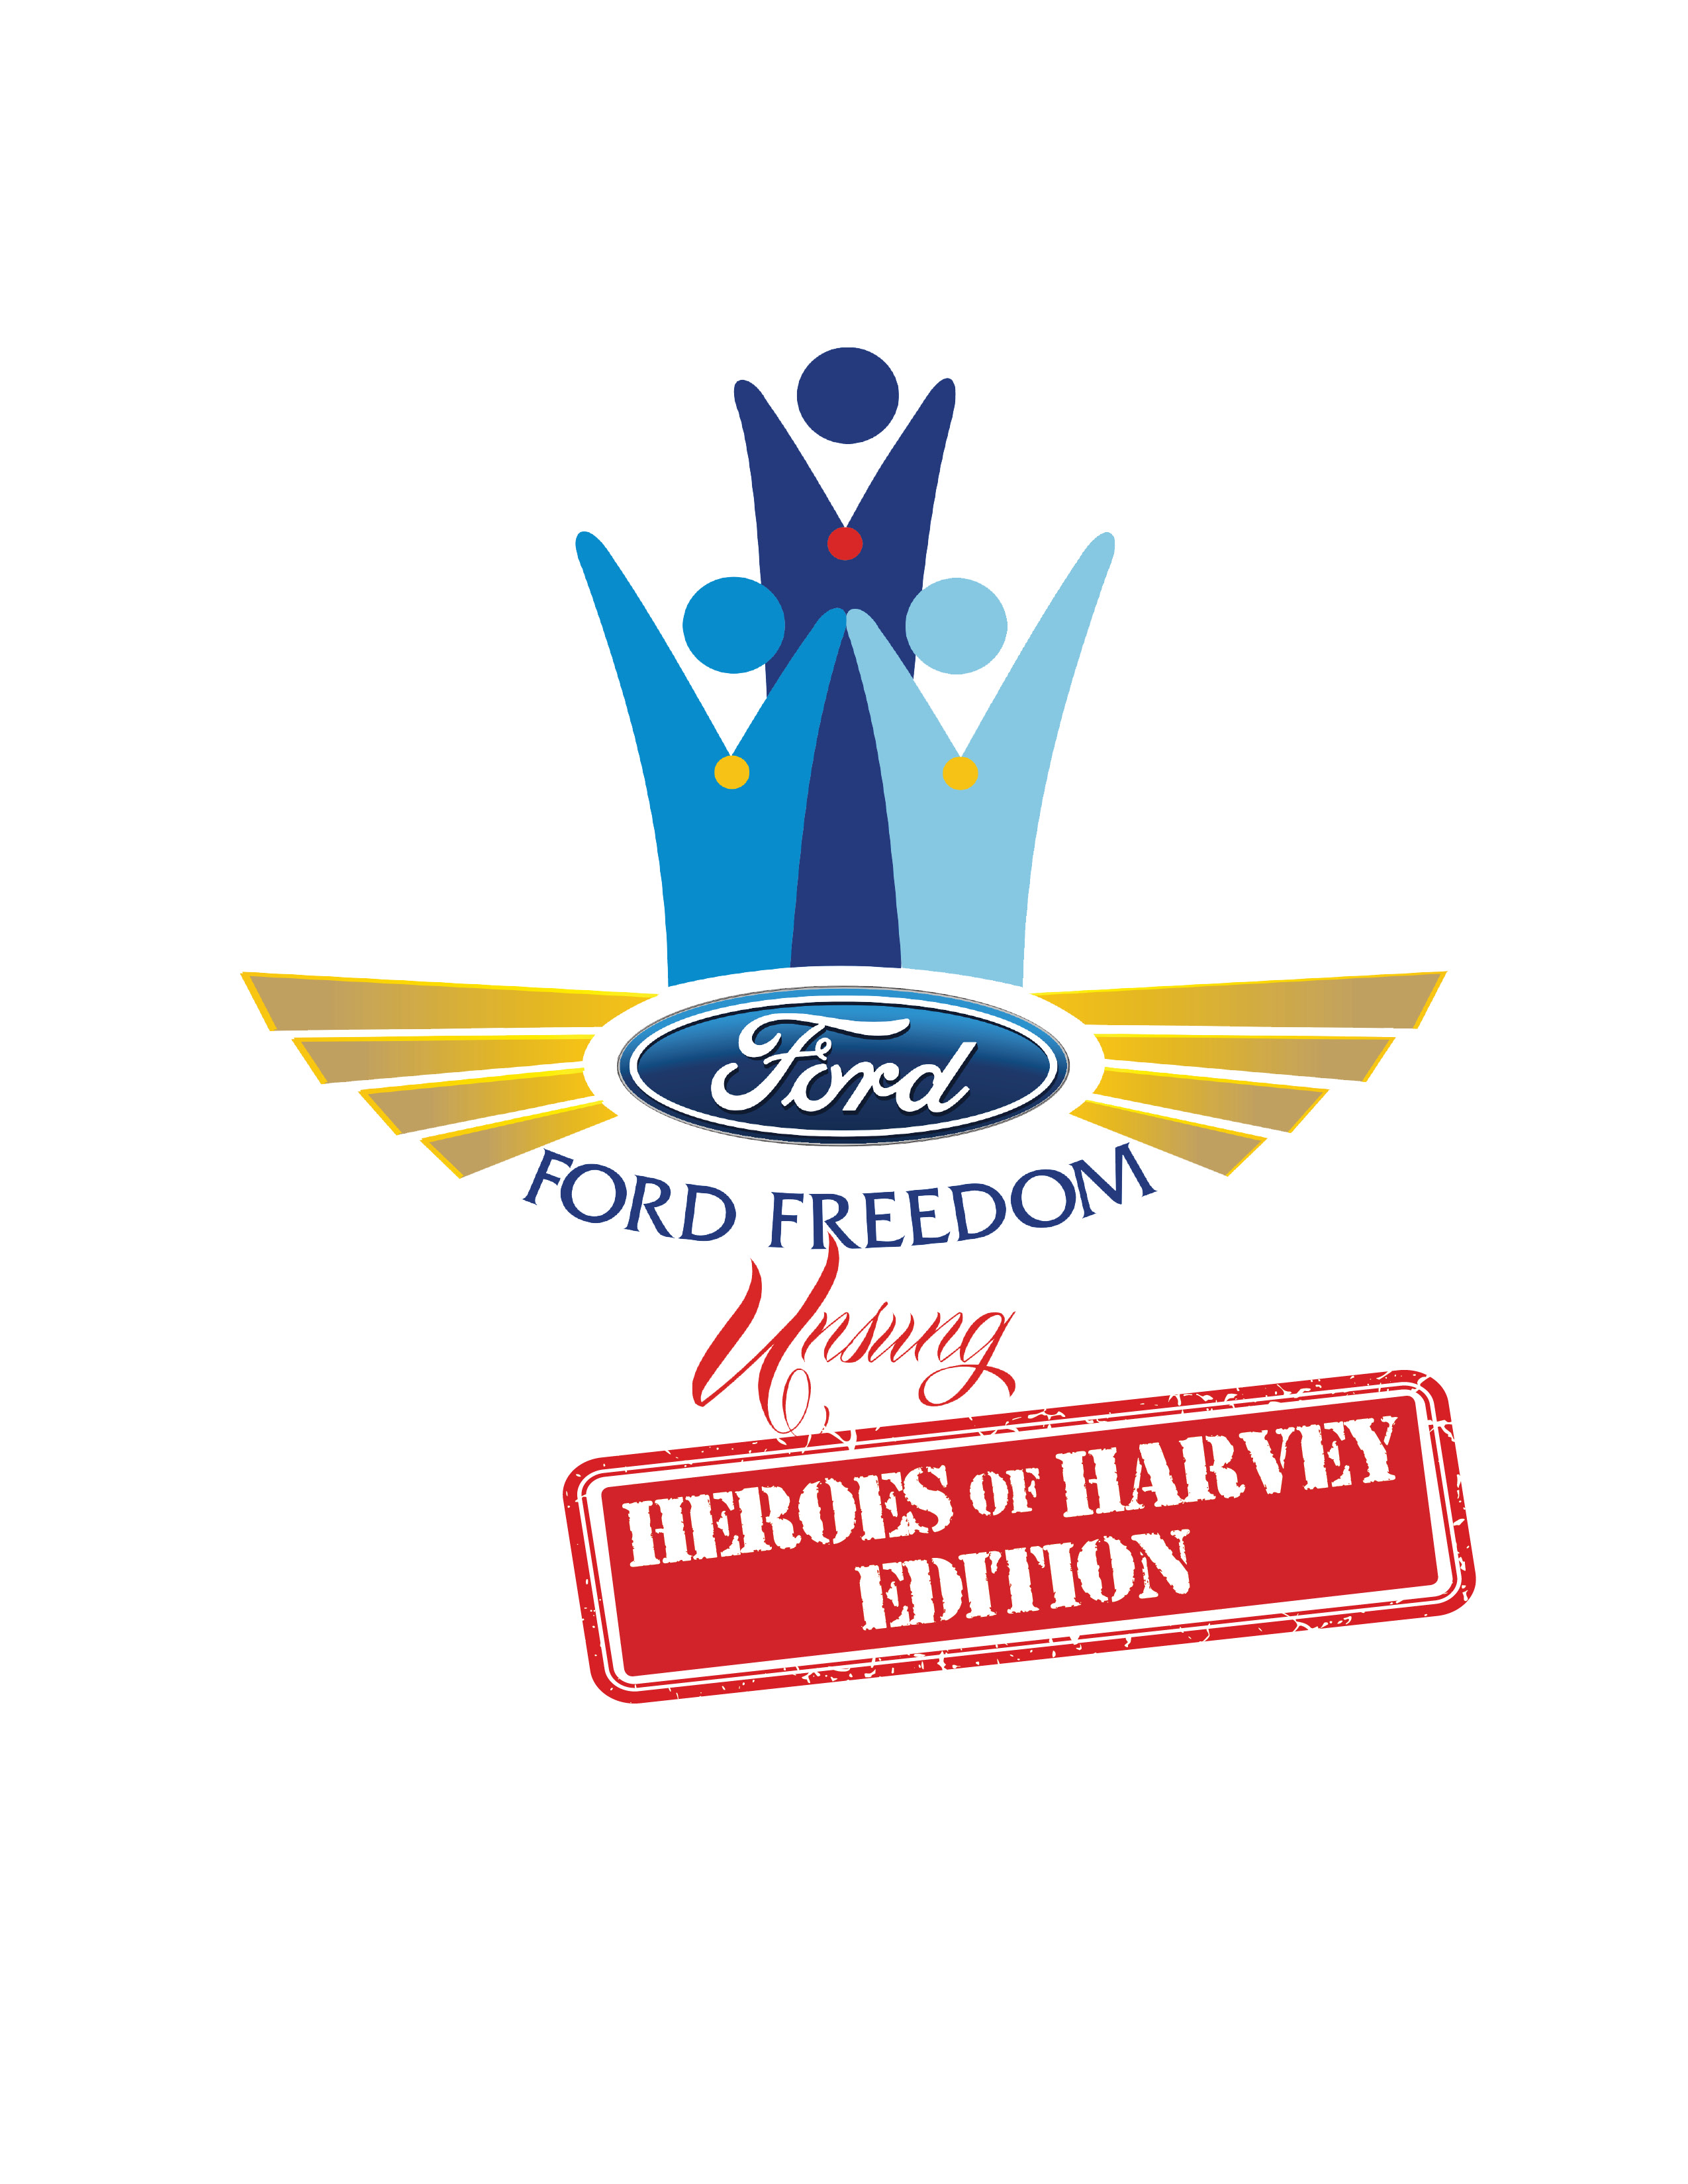 Ford Freedom